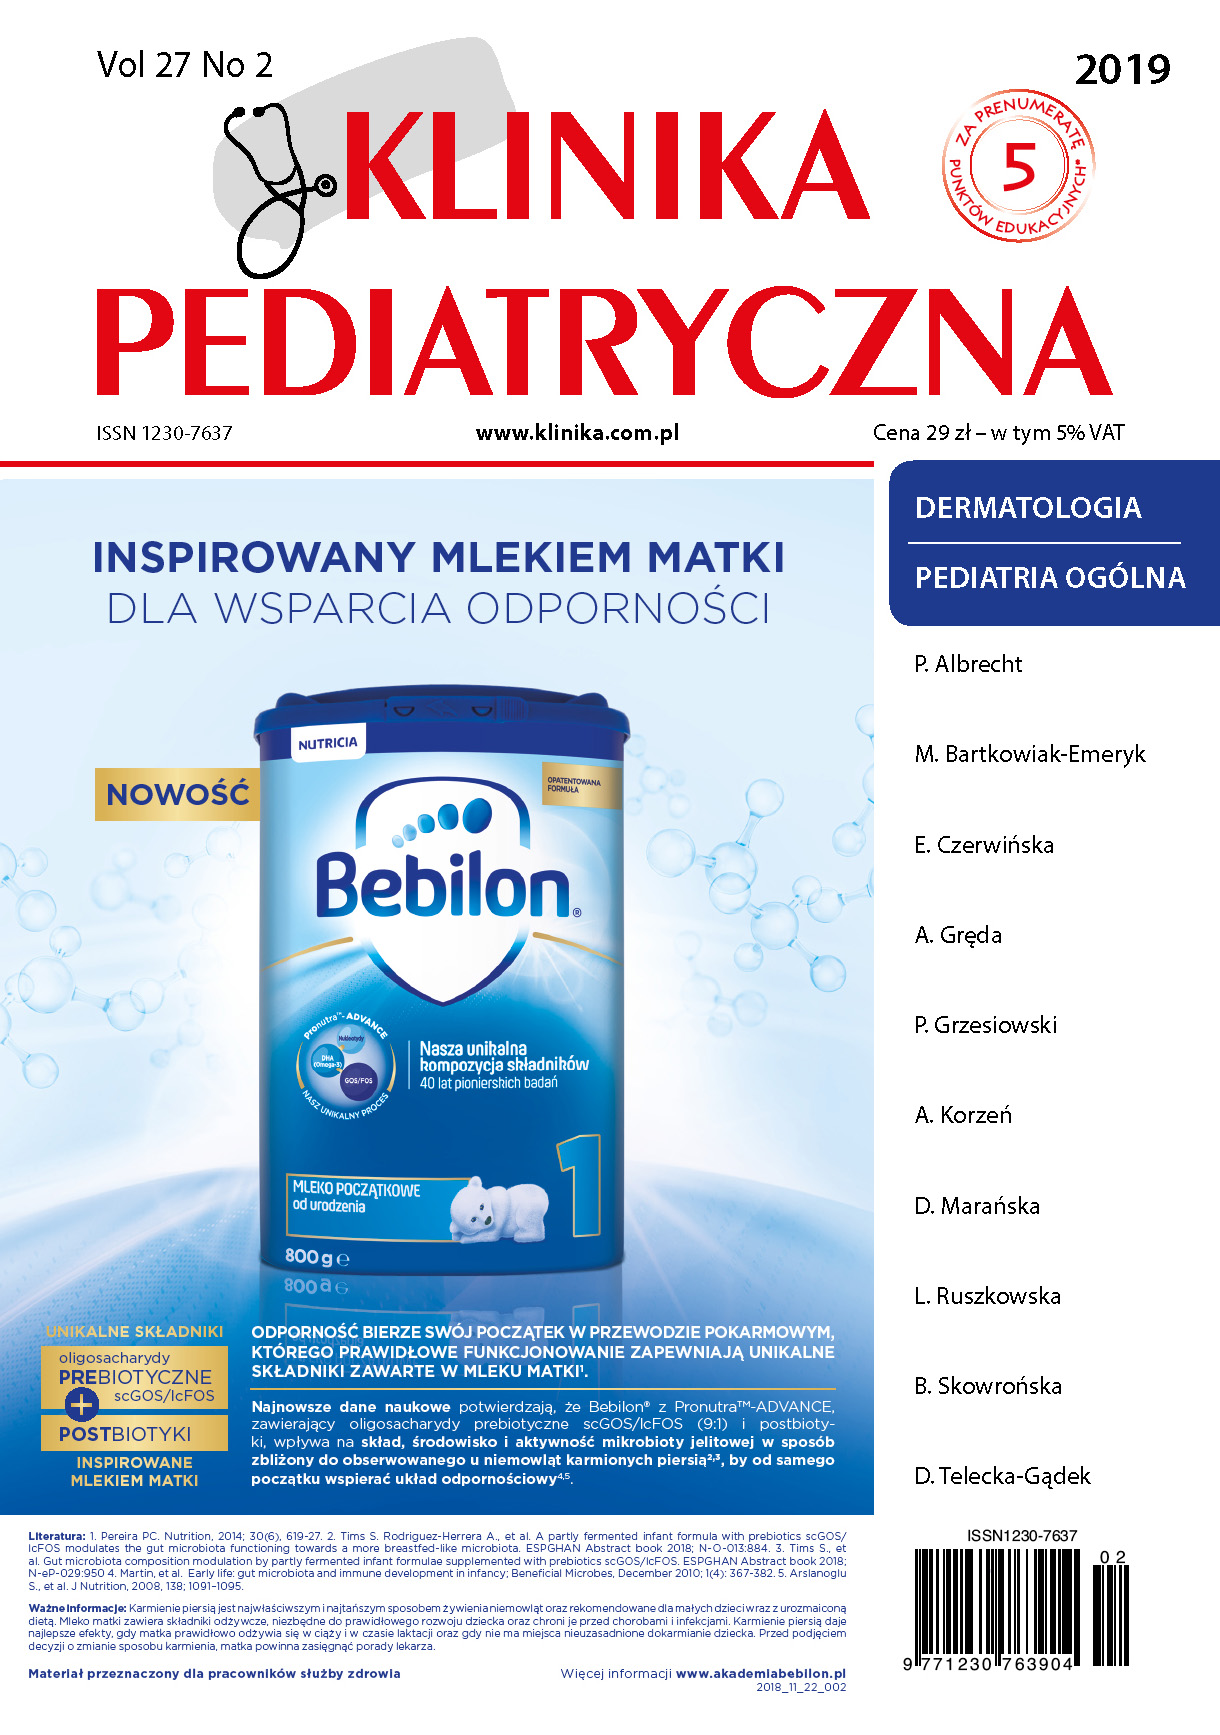 KP 2/2019 Dermatologia/Pediatria Ogólna